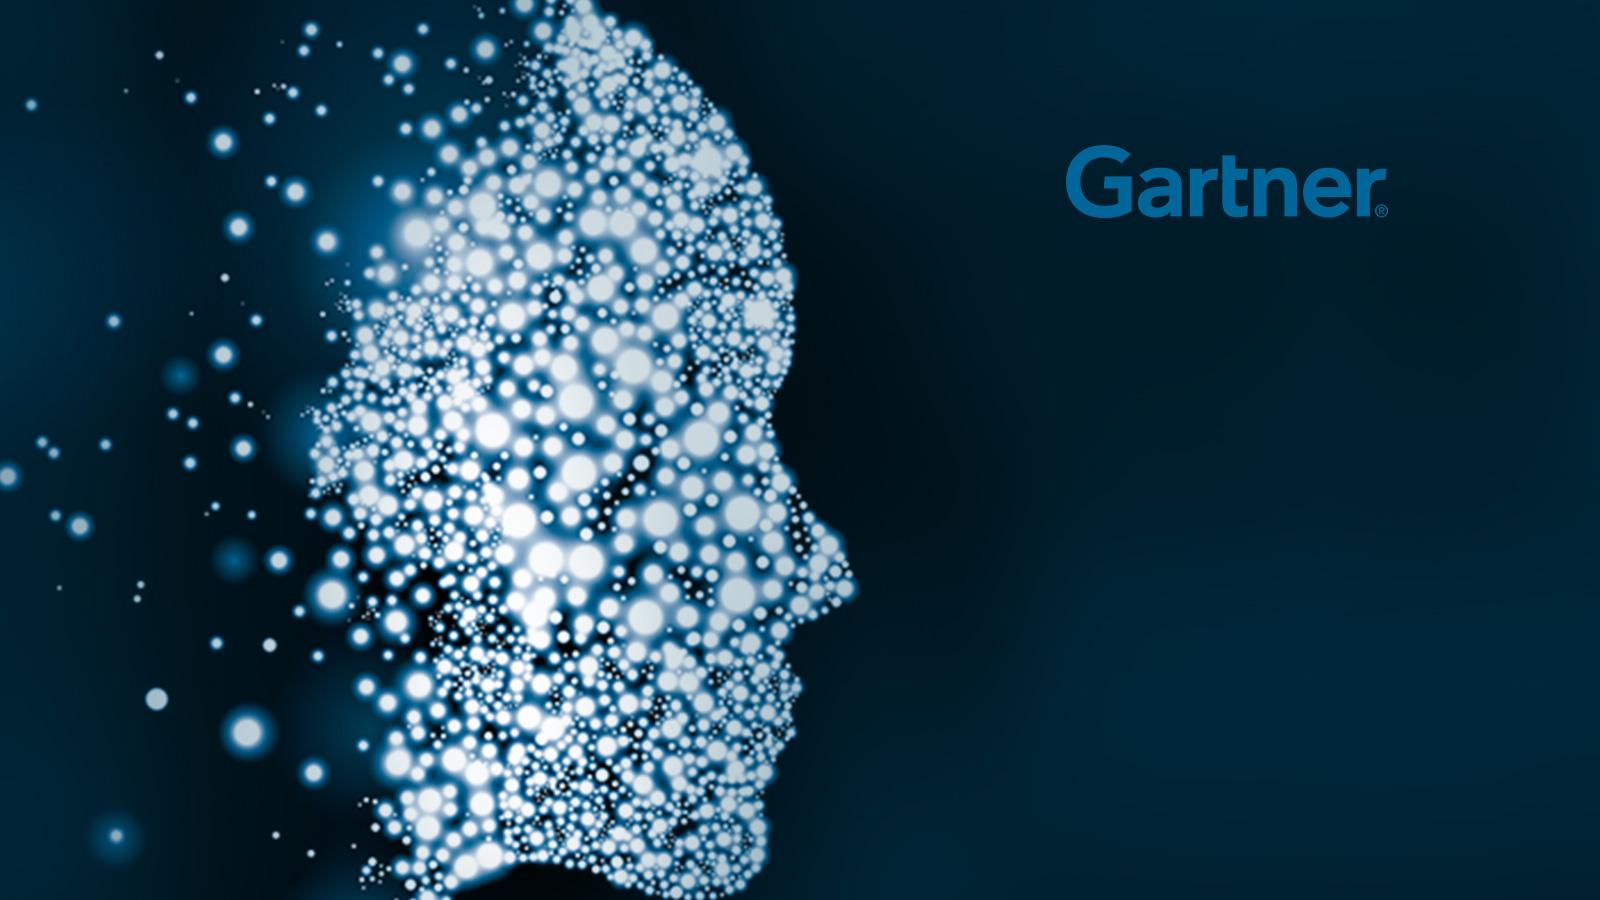 Las 10 principales tendencias tecnológicas estratégicas de Gartner para 2020 - IA Latam